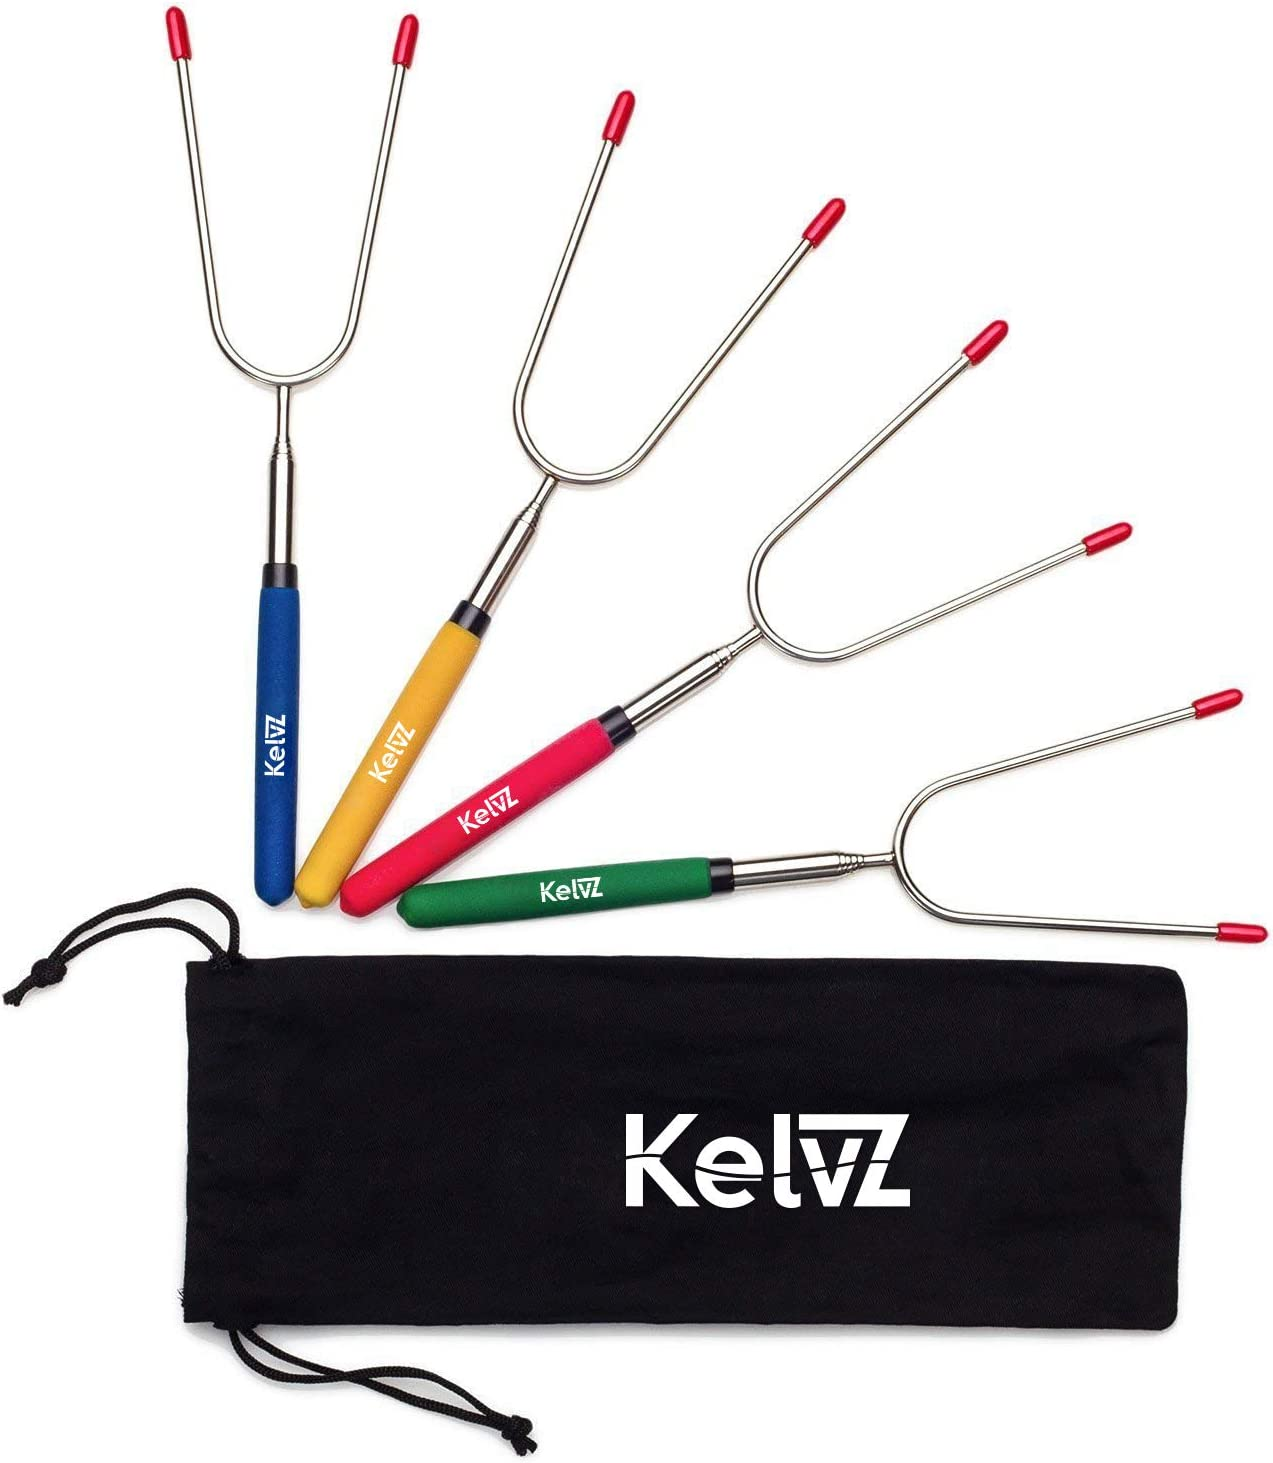 "KelvZ 34"" Telescoping Marshmallow Roasting Sticks | Set of 4 Camping Skewers | Bonus Bag & Recipes Ebook | Smores Sticks for Fire Pit | Hot Dog Sticks | Campfire Forks Camping Equipment Camping Gear"